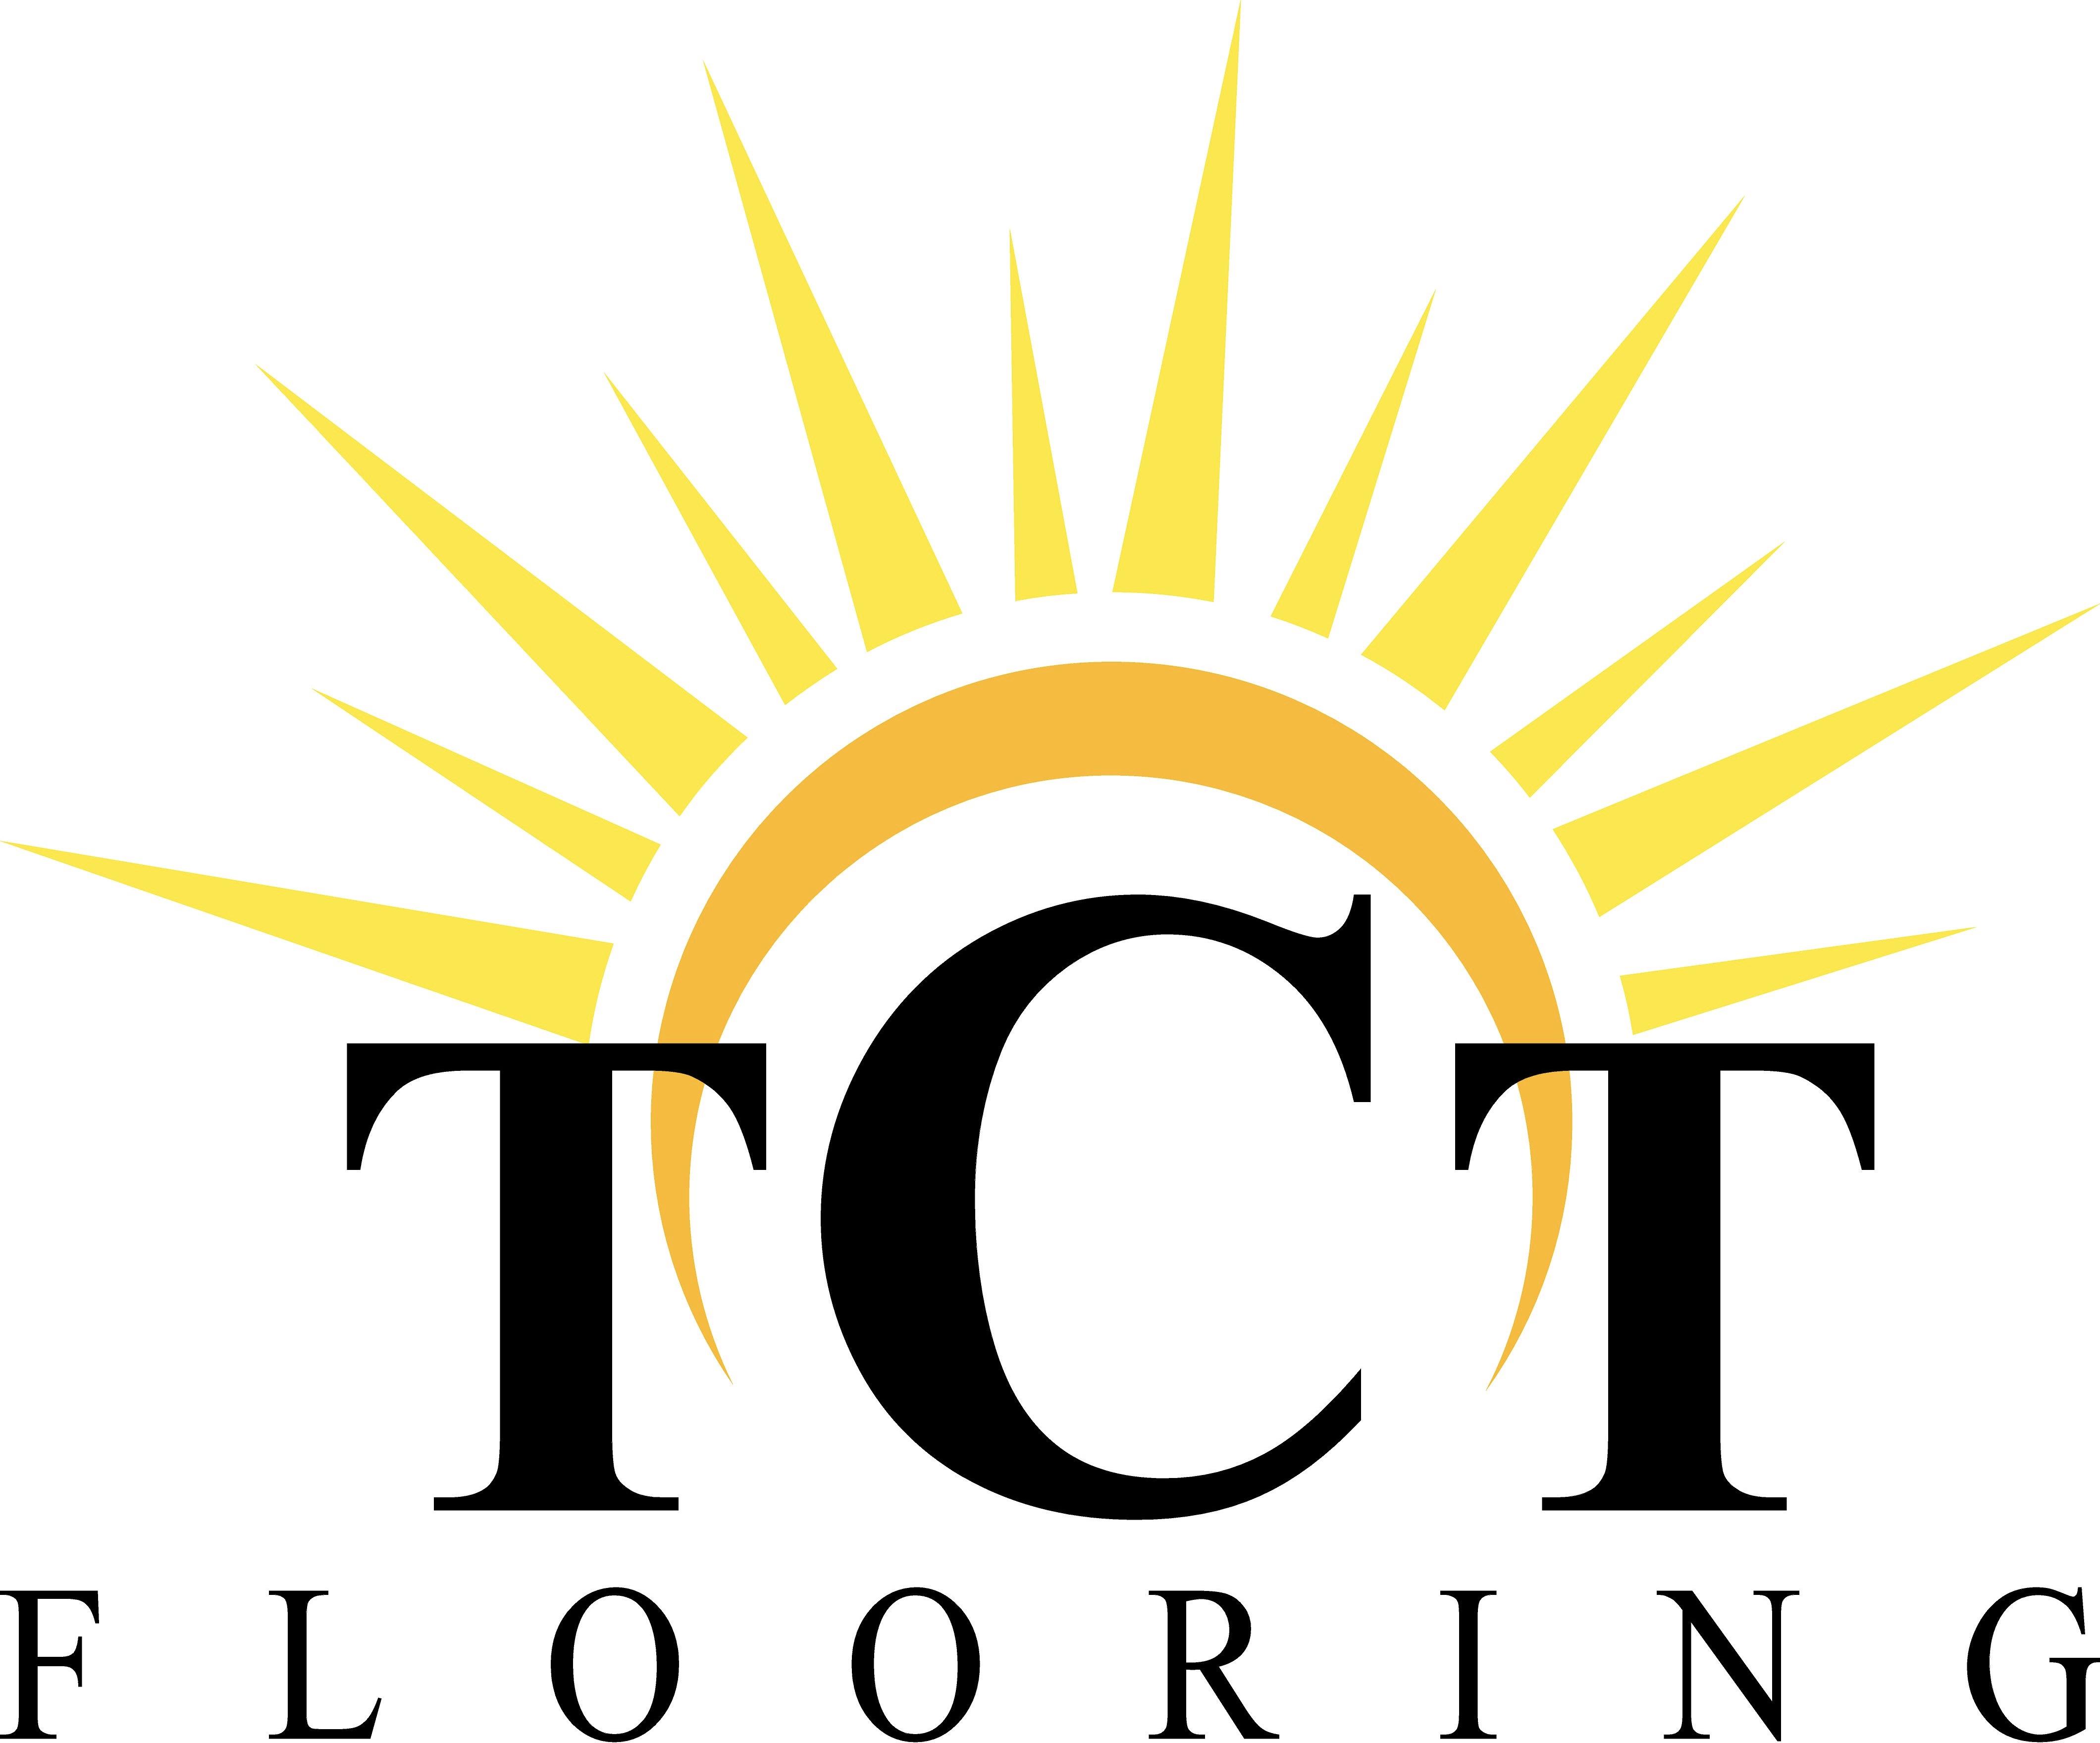 TCT flooring inc store front